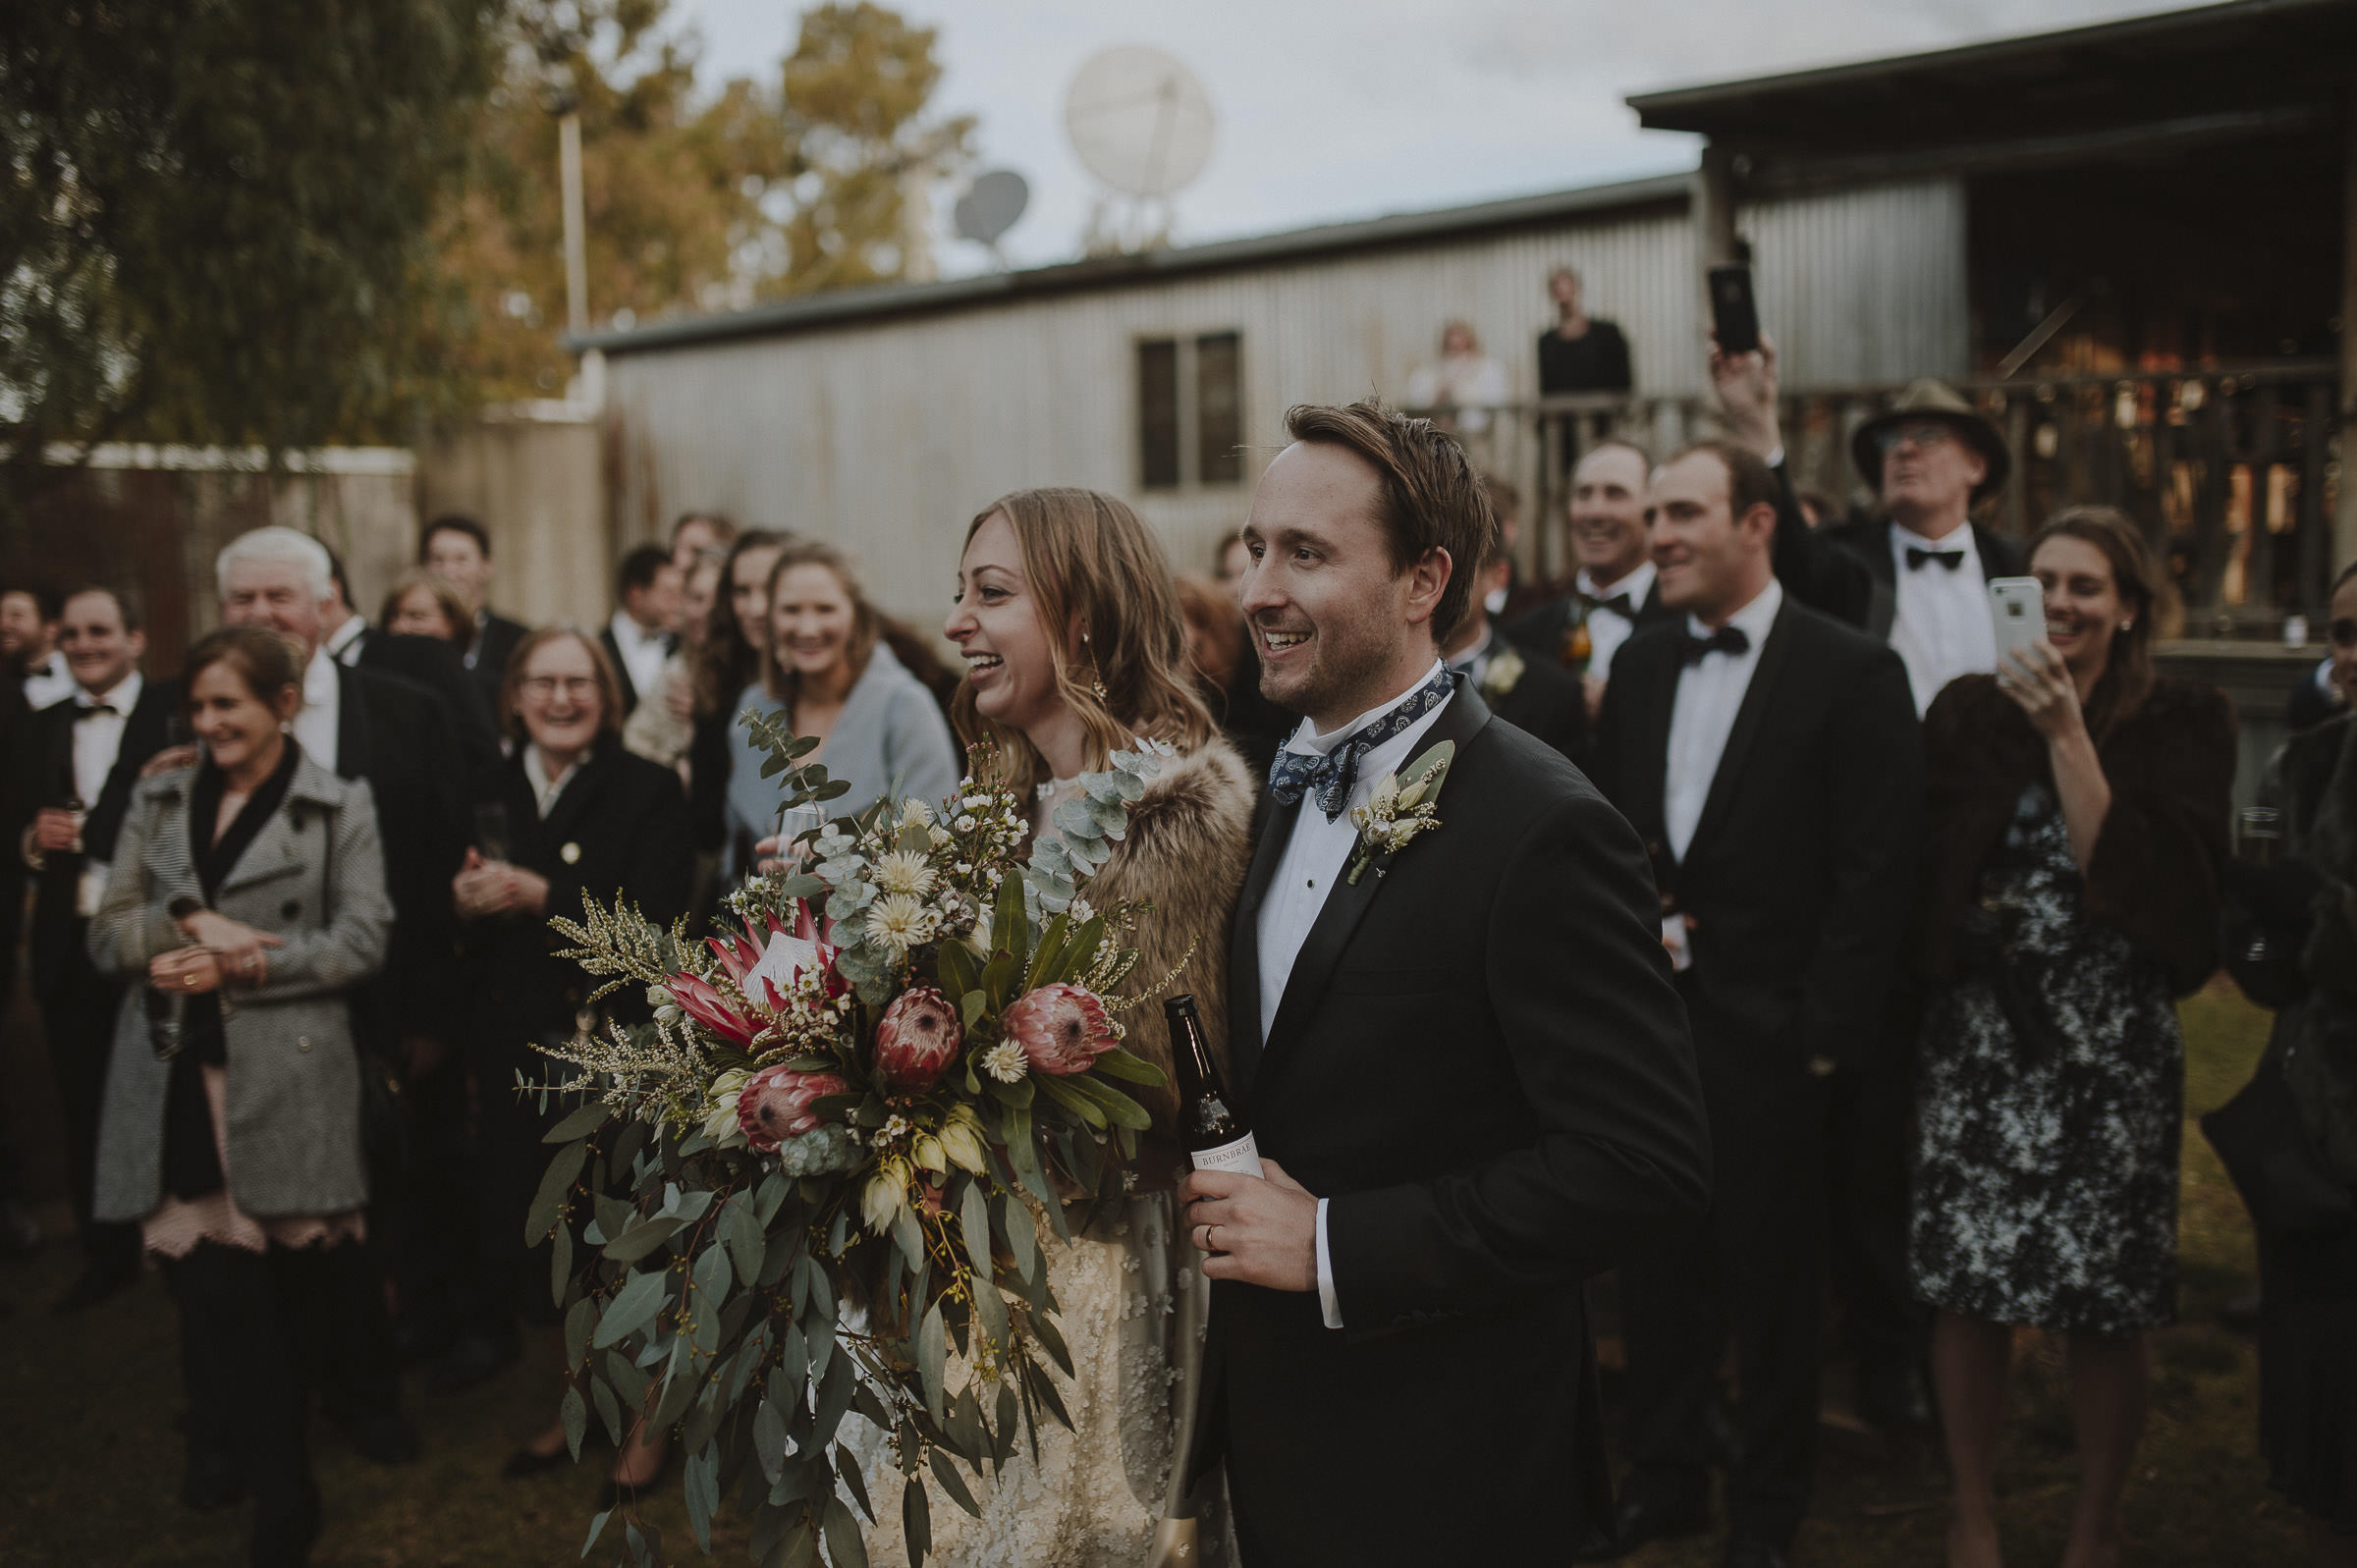 Emily_Skewesy_Mudgee_Wedding_Blog-27.jpg